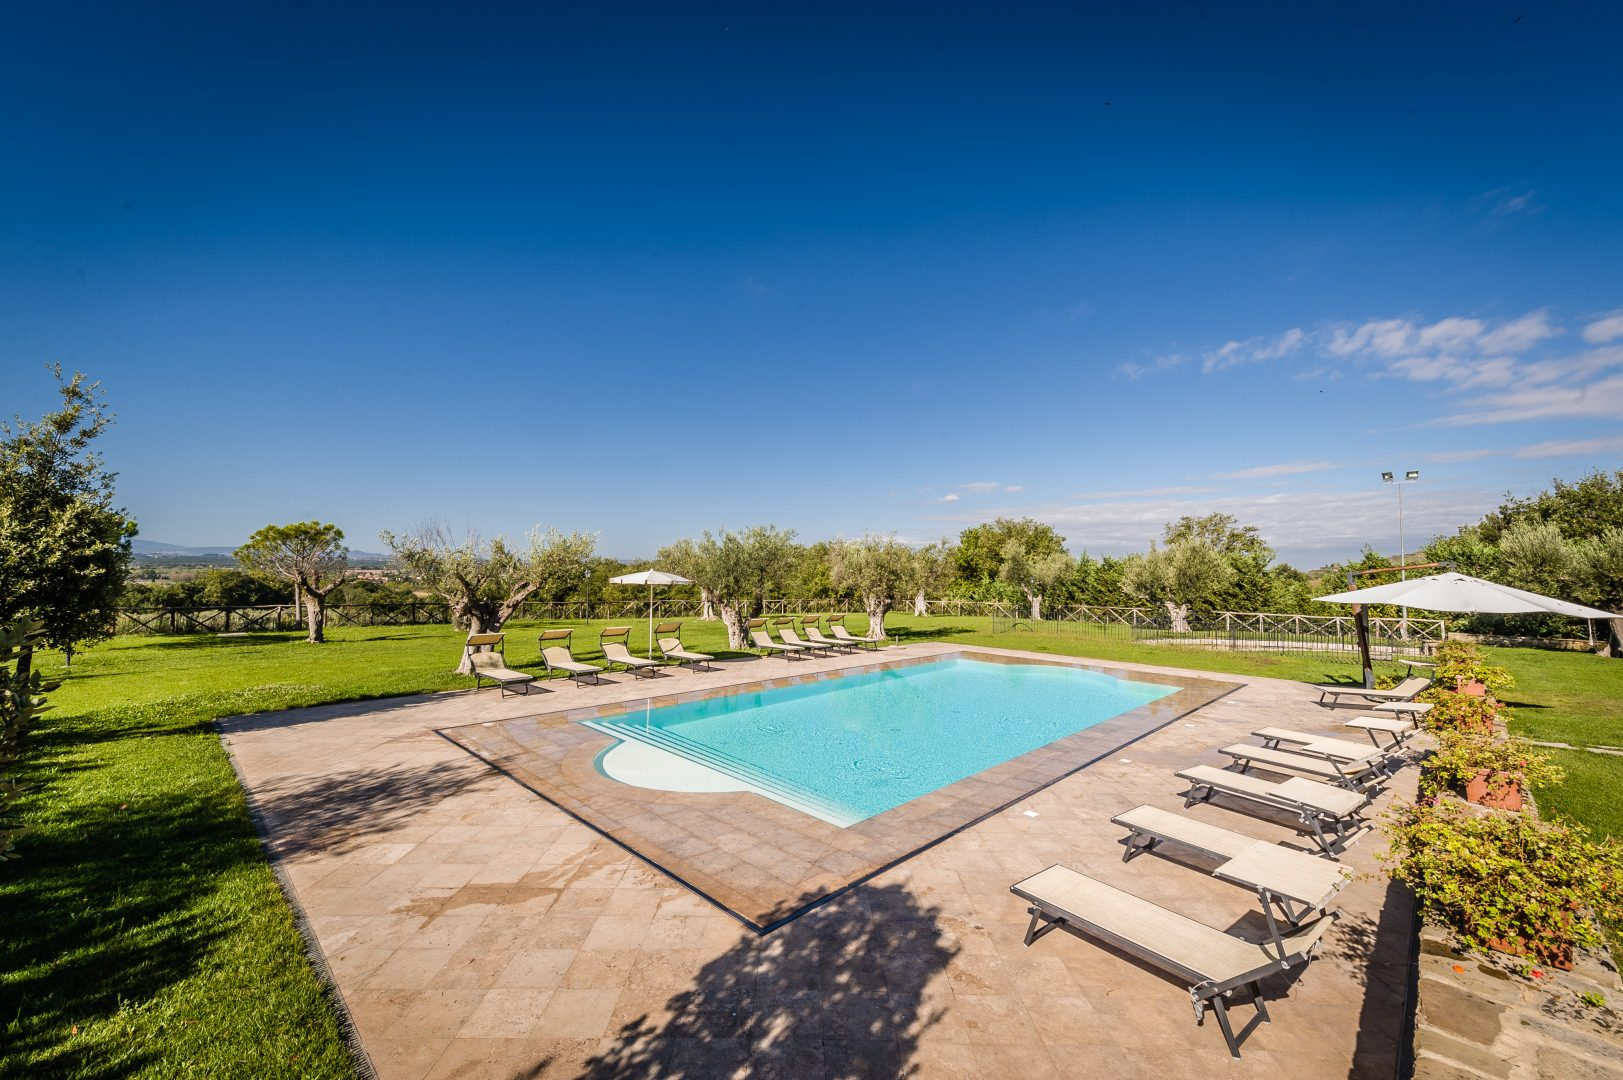 piscina con scala romana, sfioro trilogy, rivestimento bianco